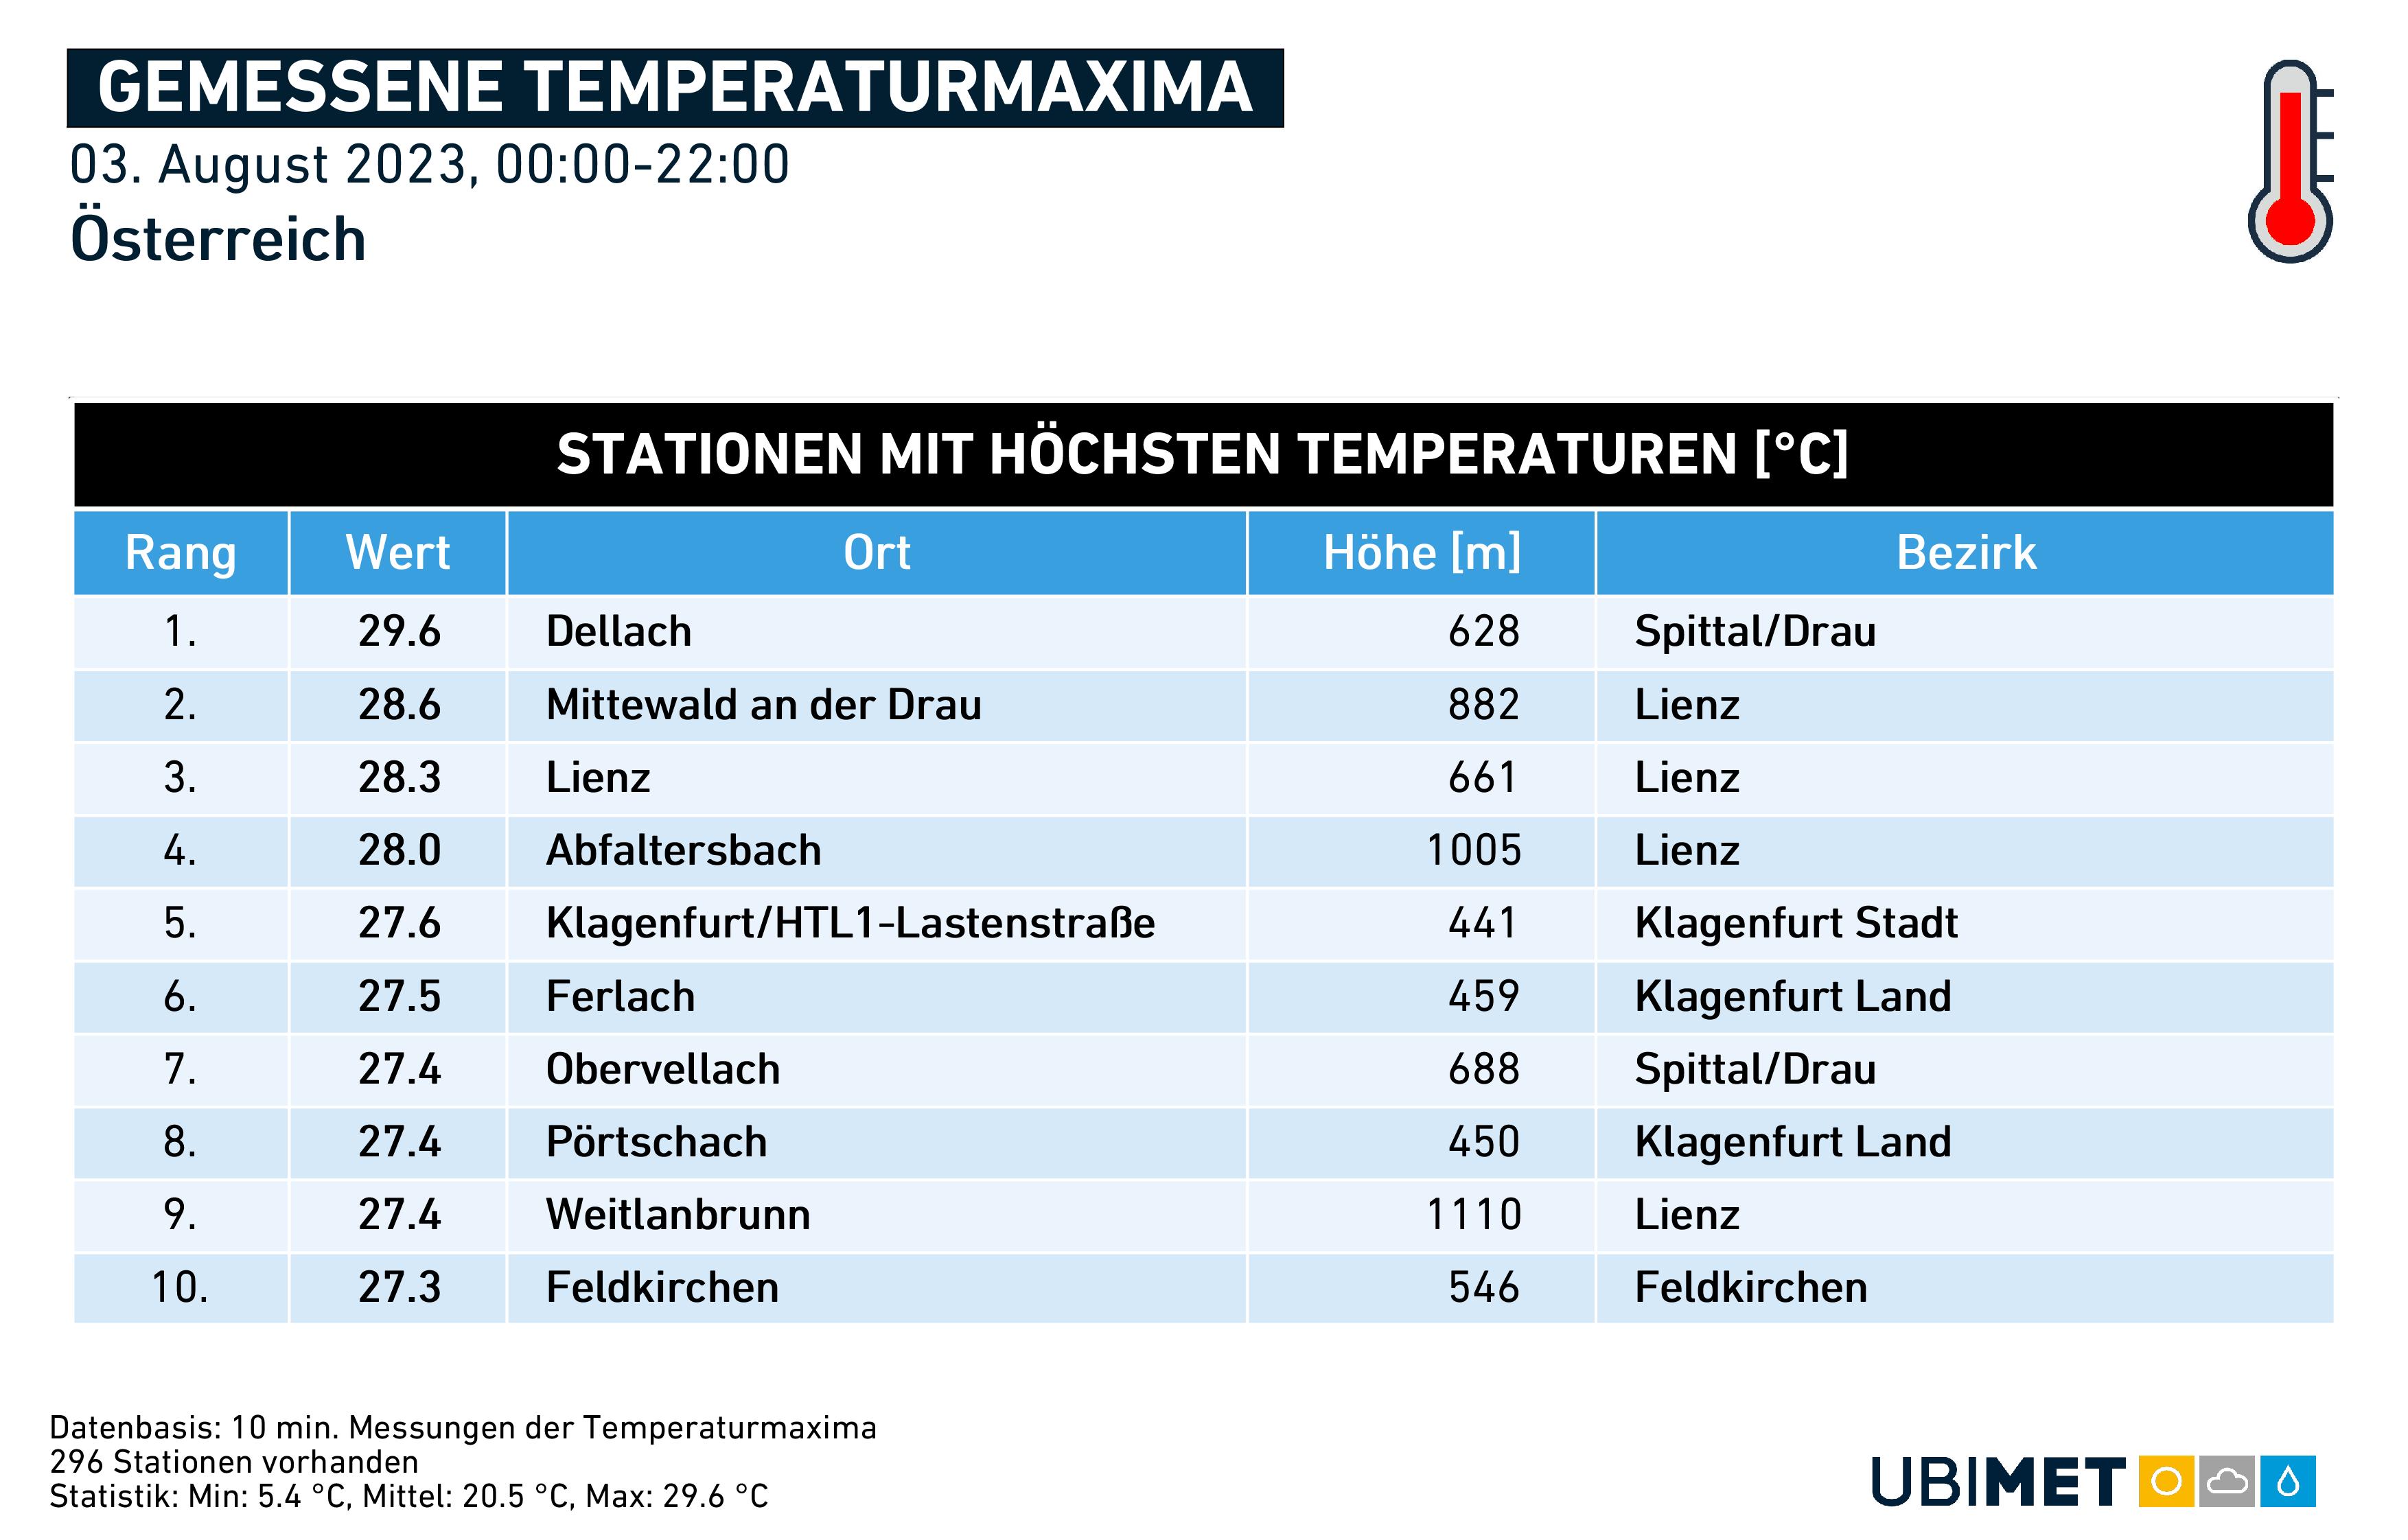 Gemessen Temperaturmaxima